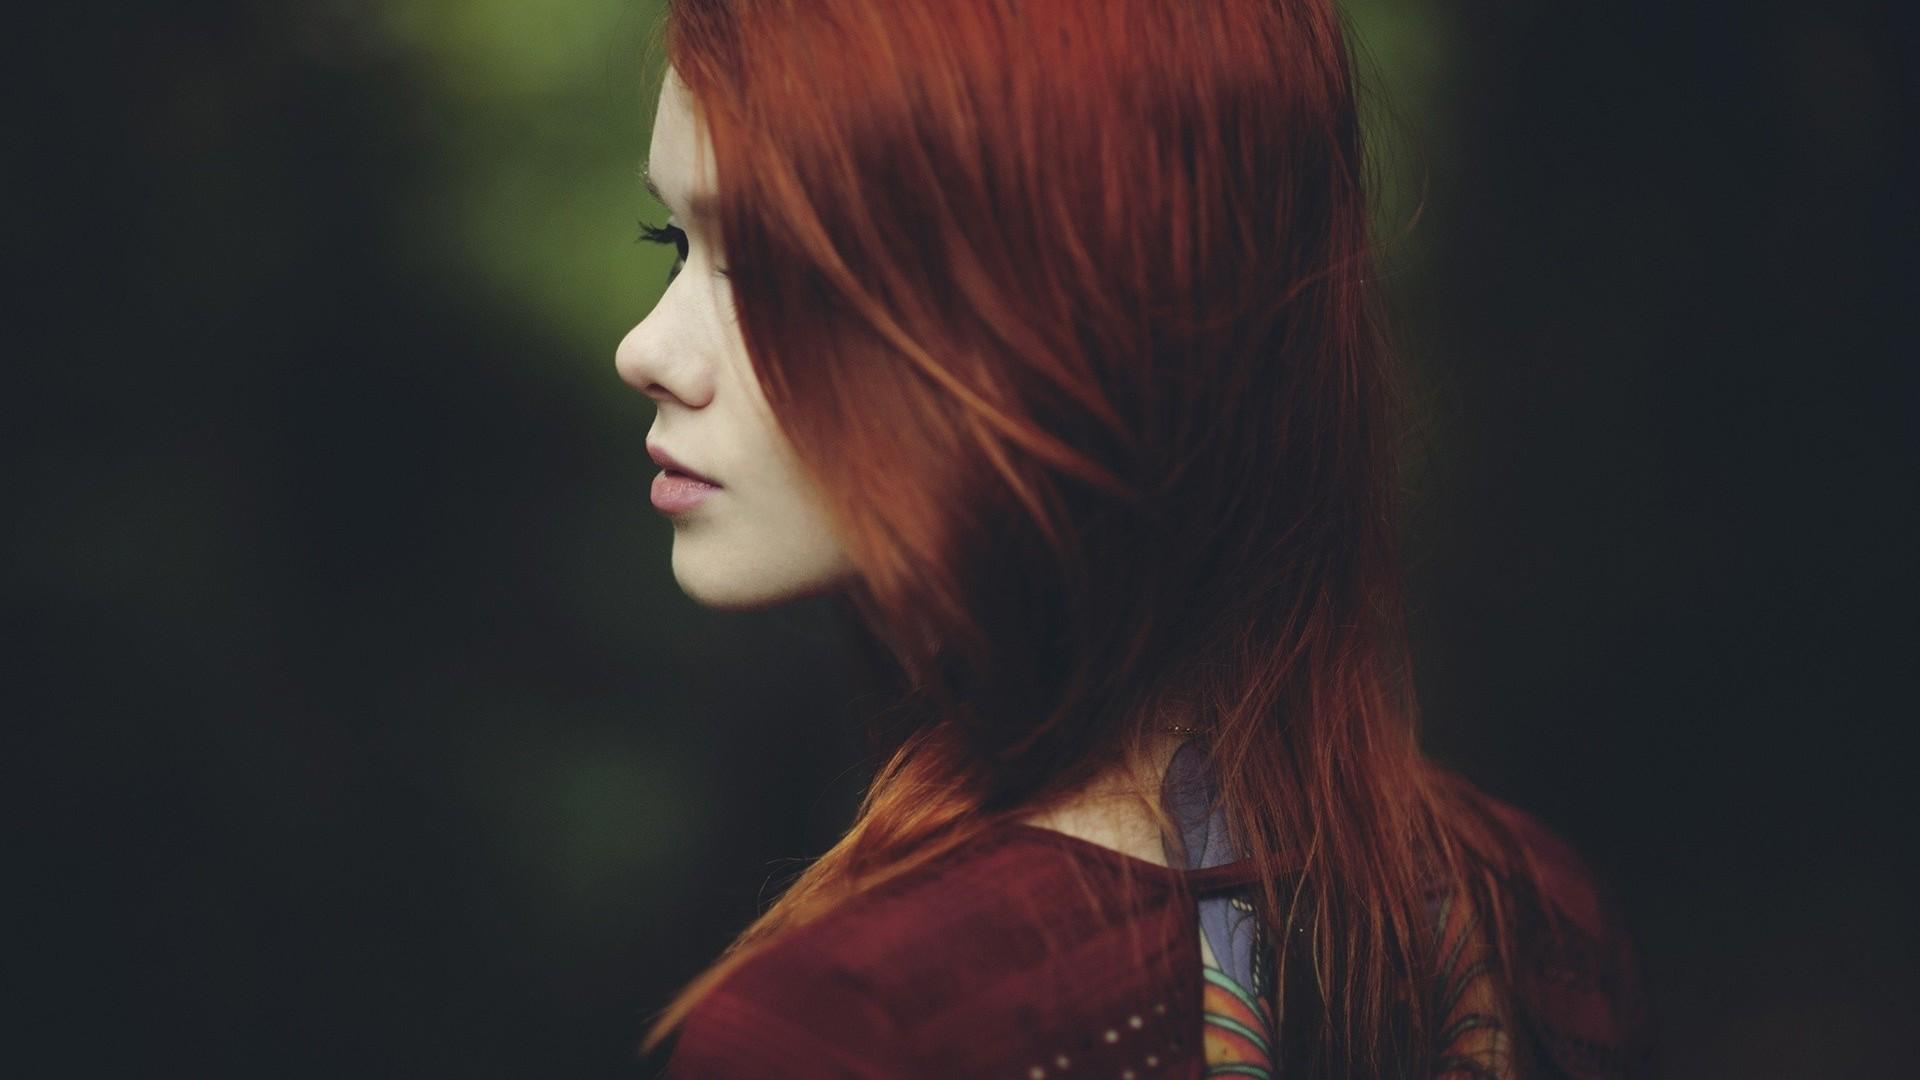 Hintergrundbilder Frau Rothaarige Modell Porträt Lange Haare